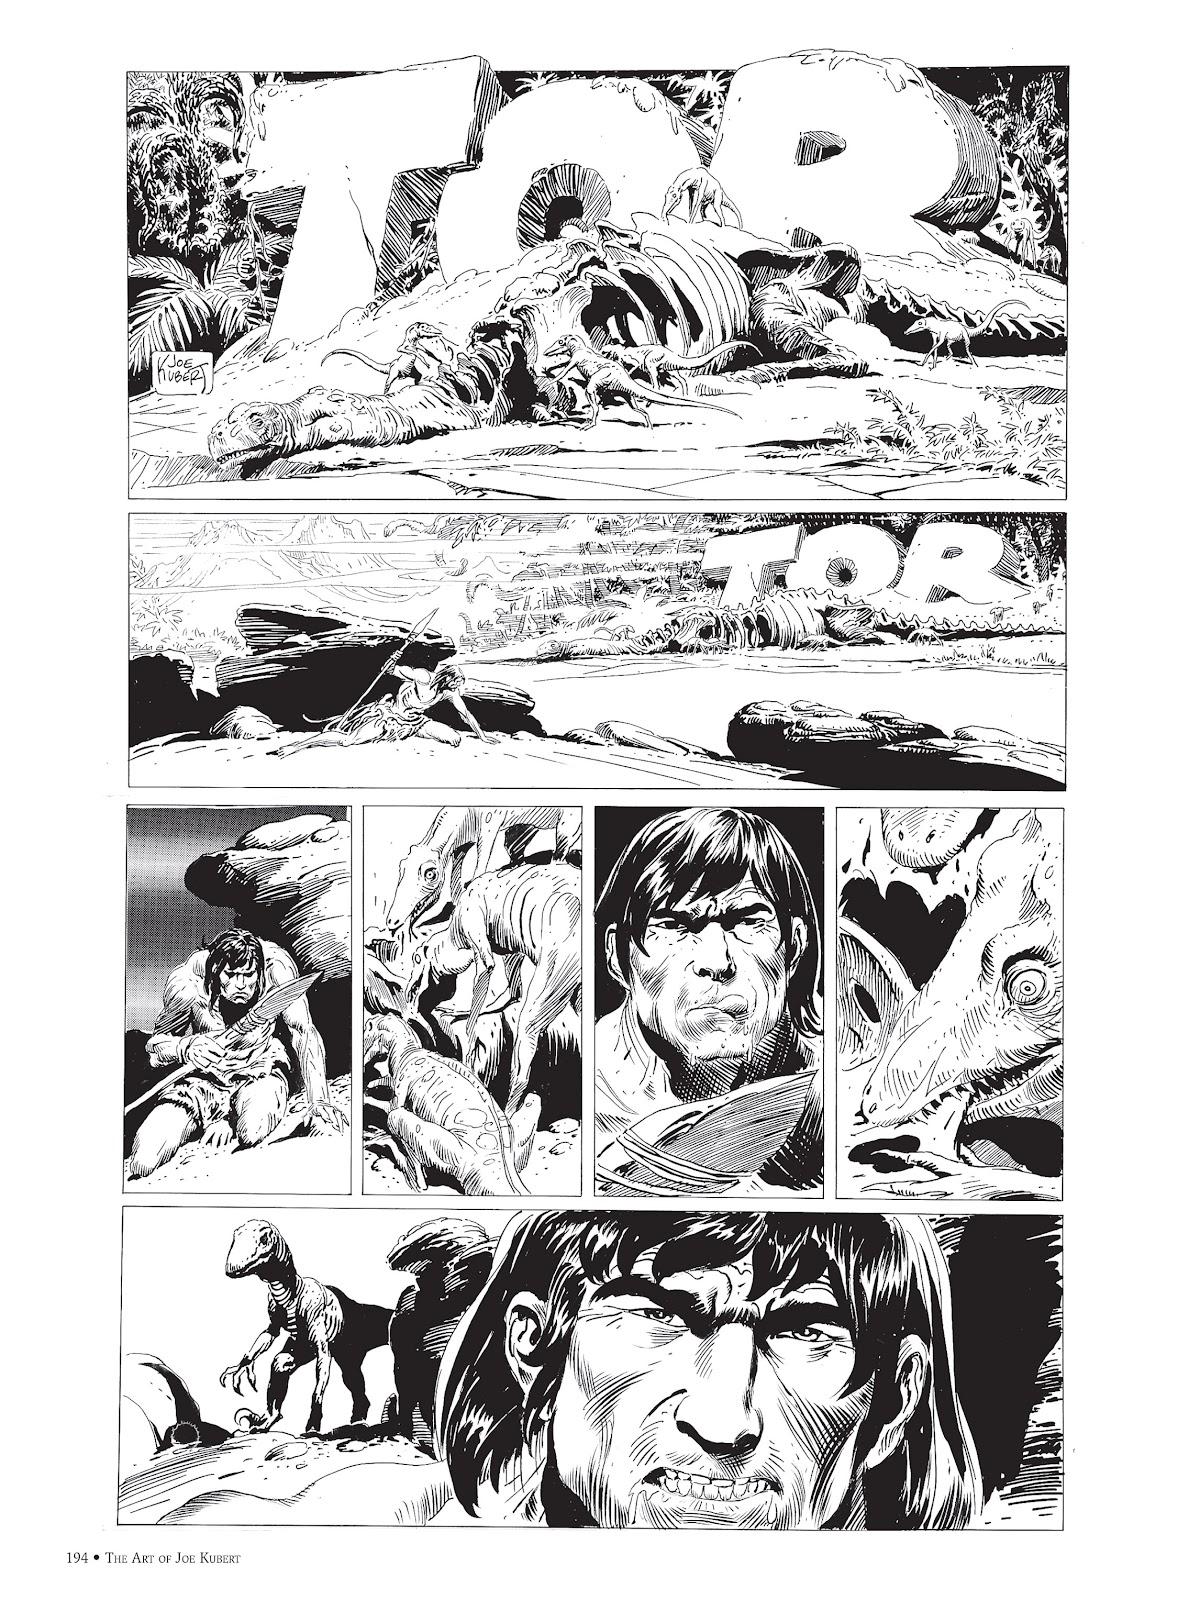 Read online The Art of Joe Kubert comic -  Issue # TPB (Part 2) - 94